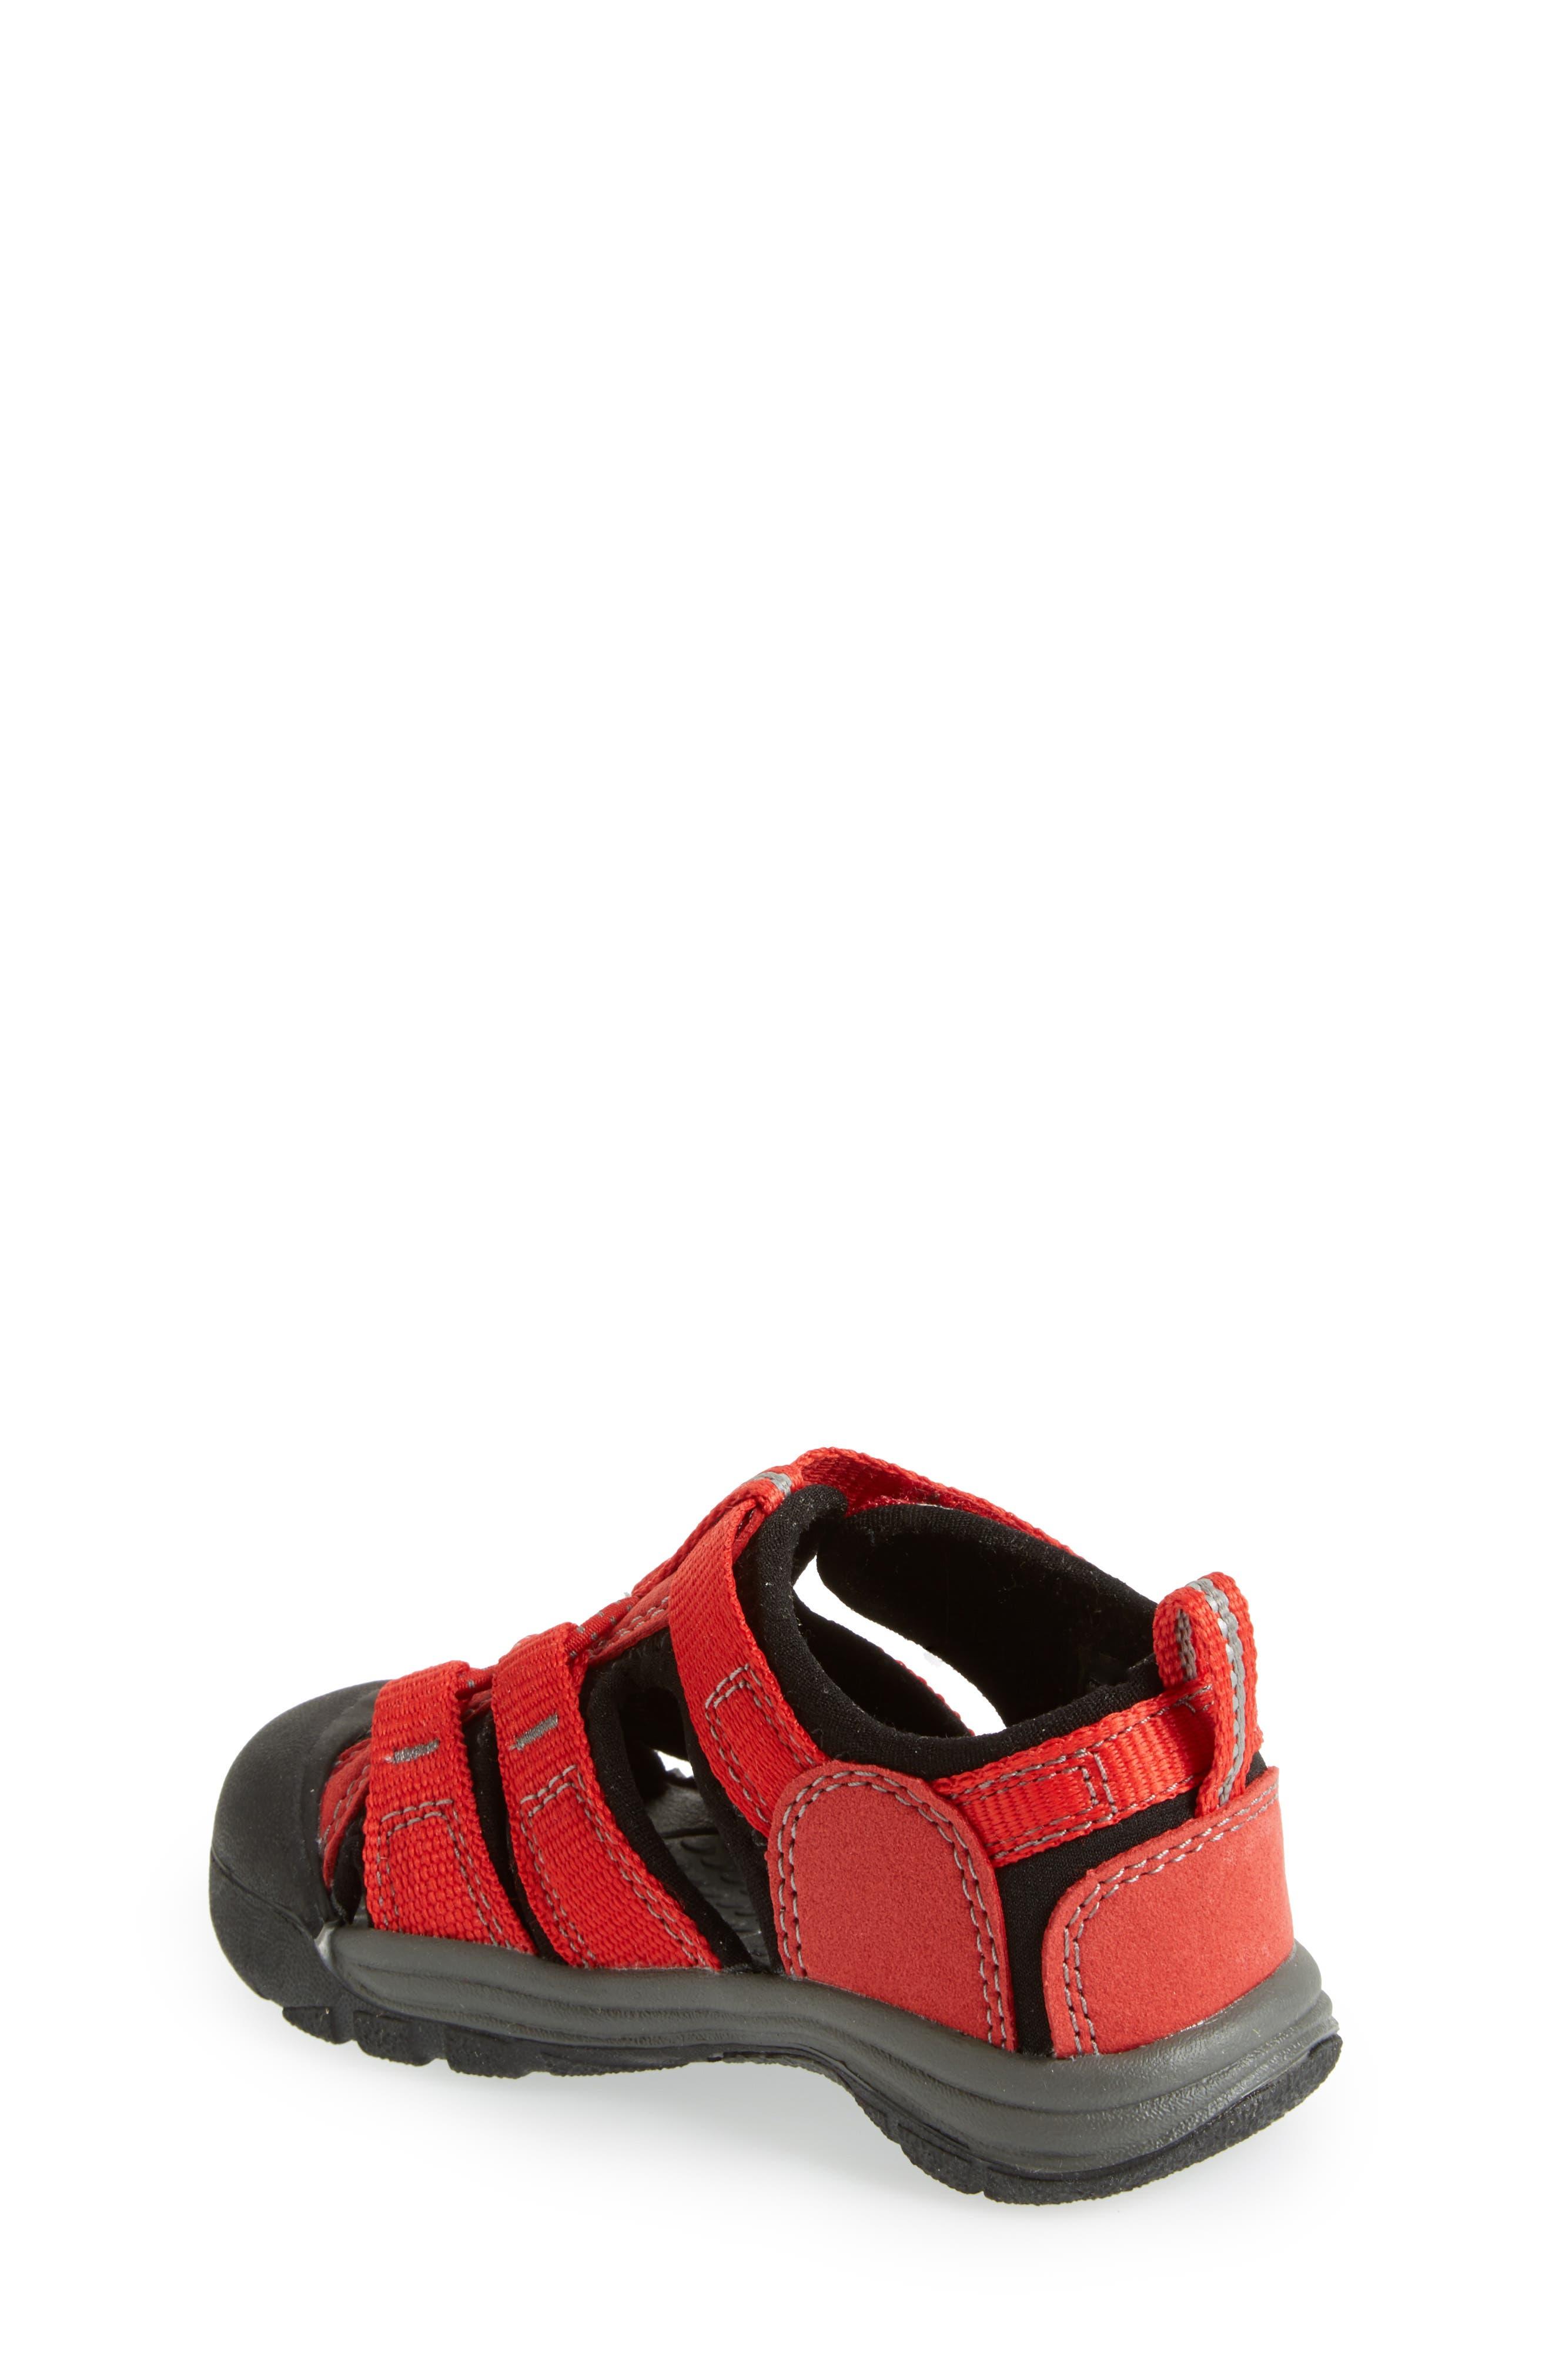 'Newport H2' Water Friendly Sandal,                             Main thumbnail 49, color,